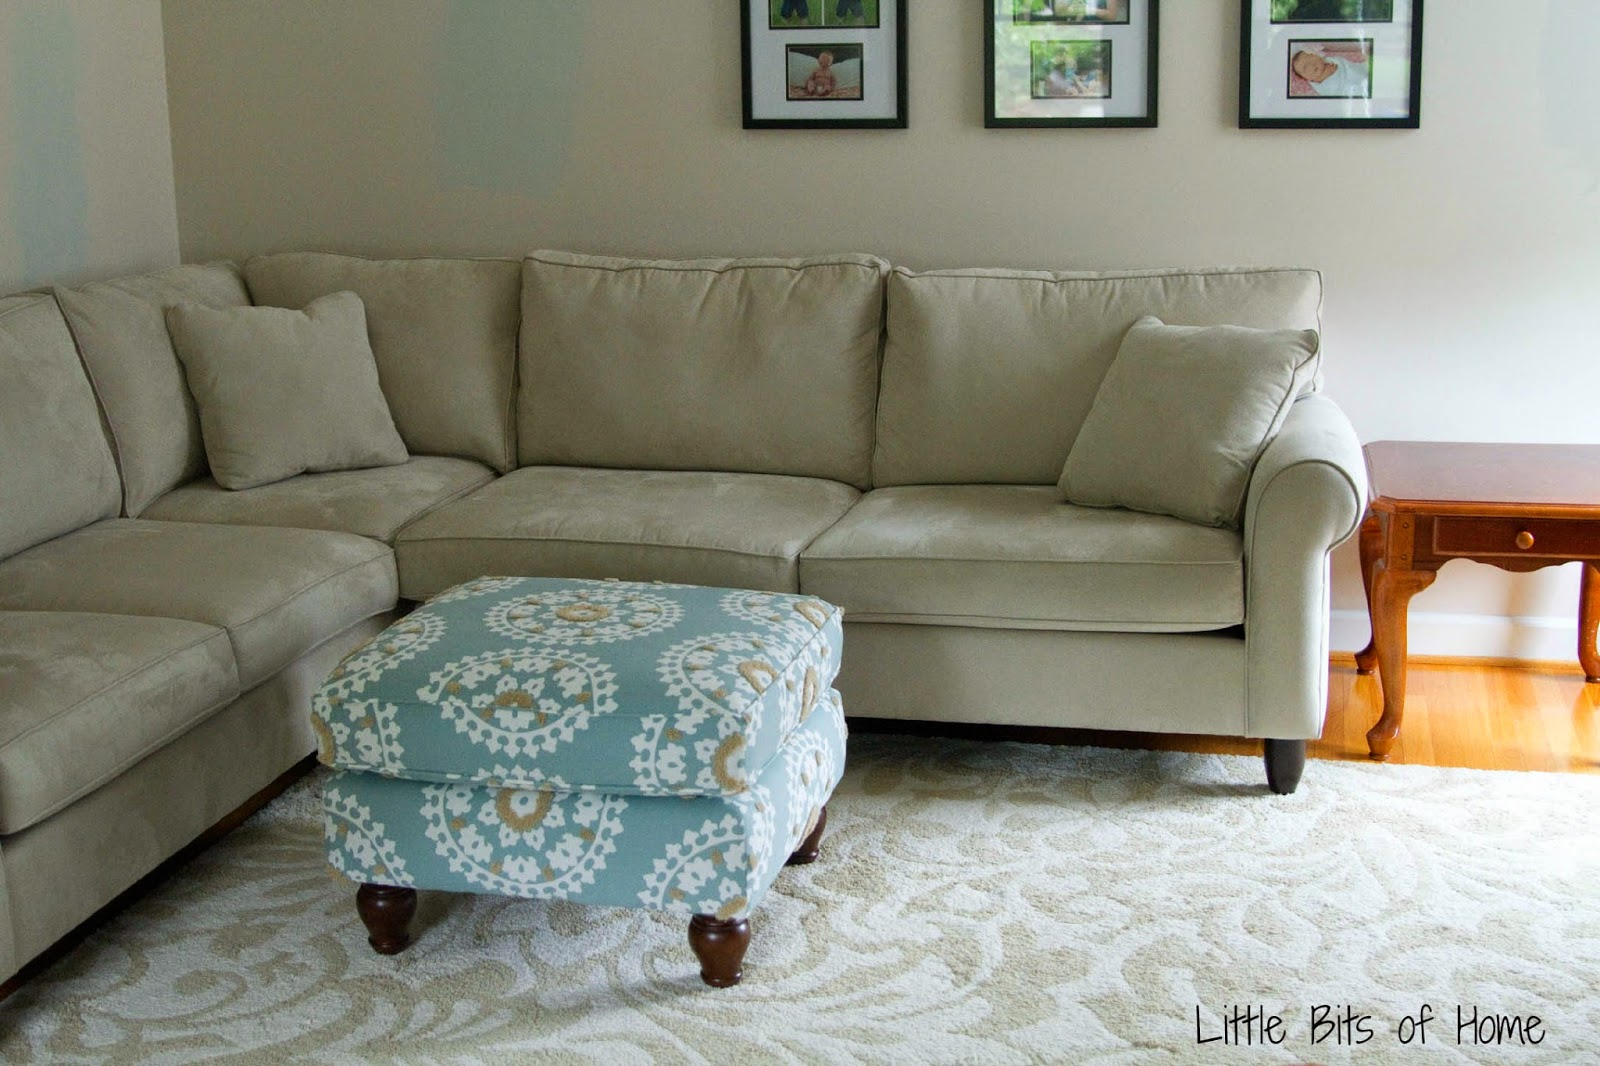 Living Room Makeover Furniture Edition